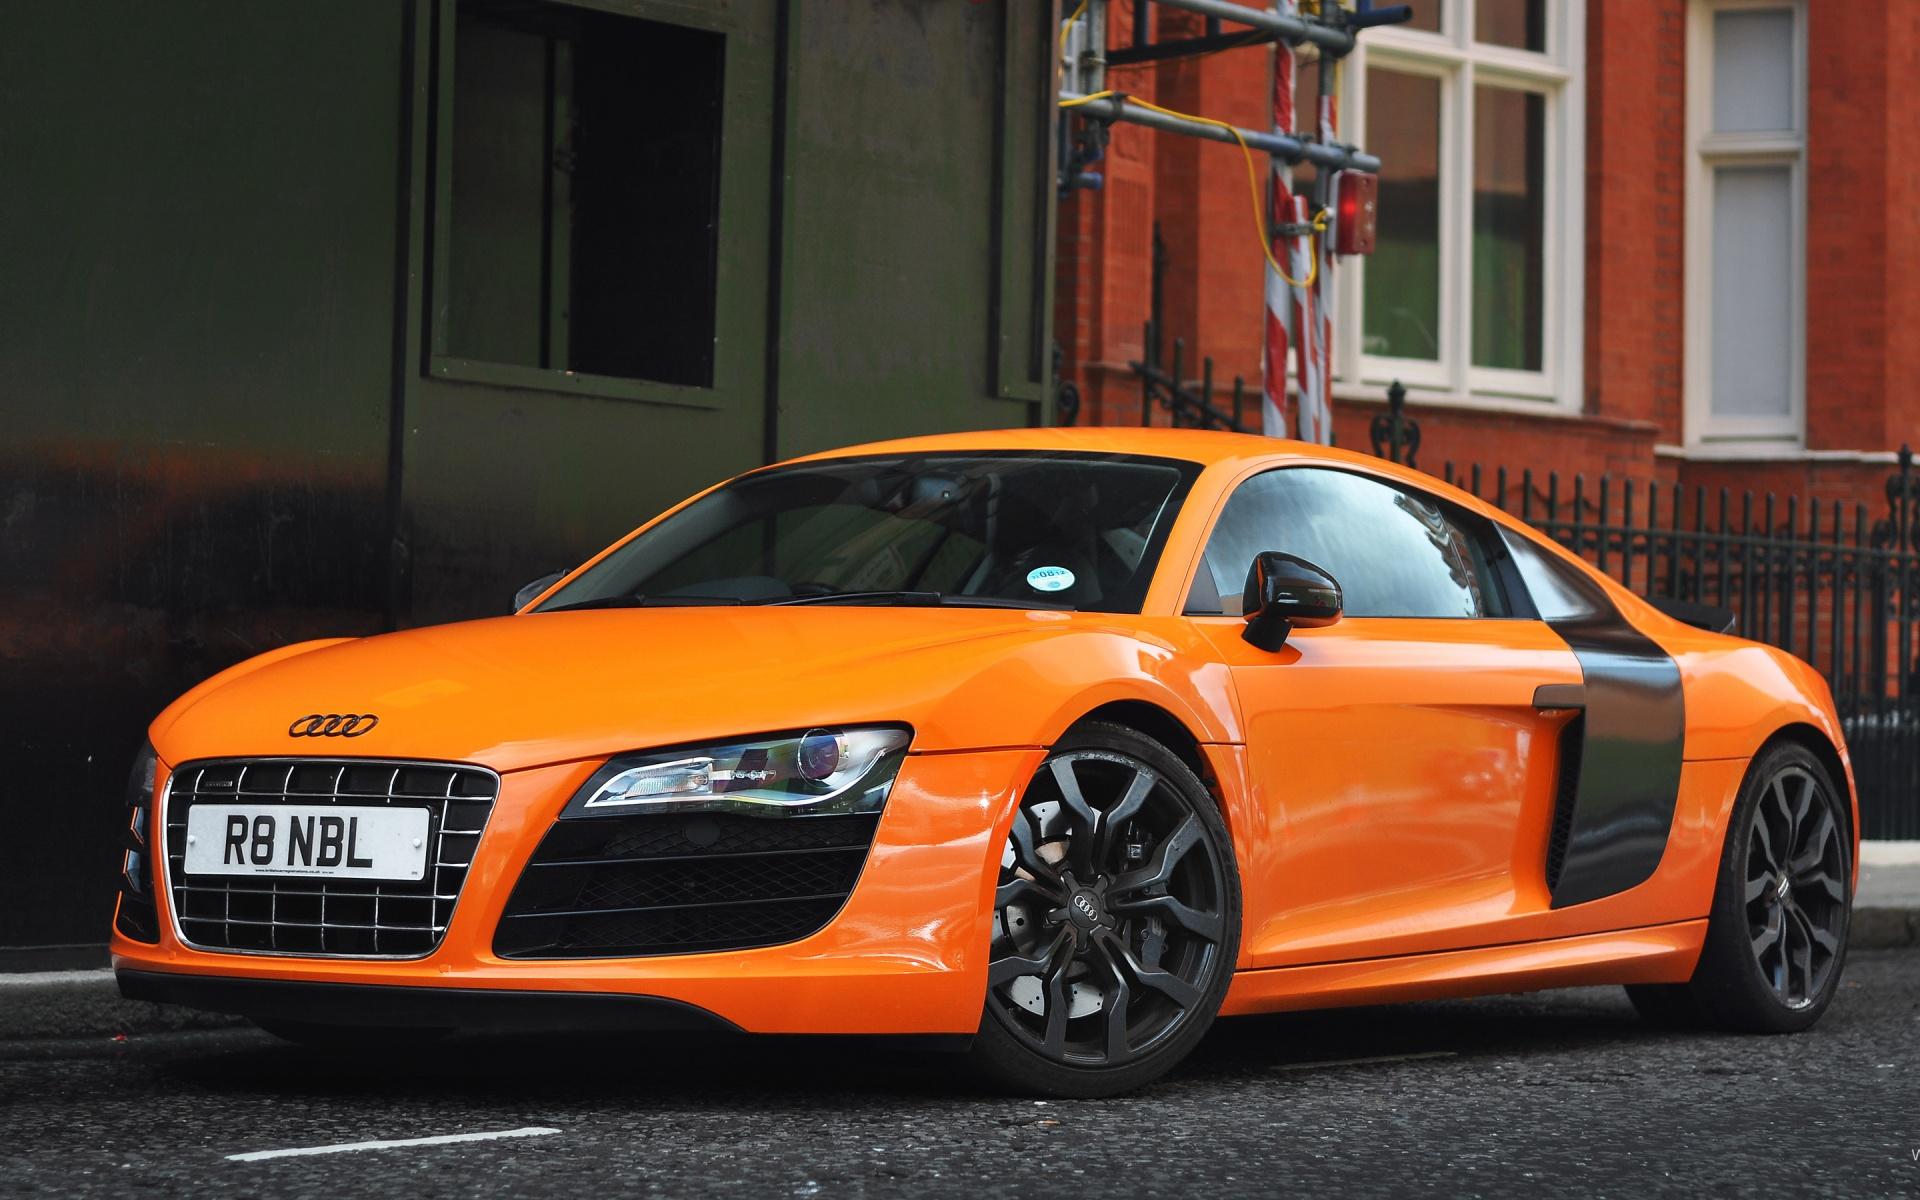 Orange Audi R8 Wallpaper 49369